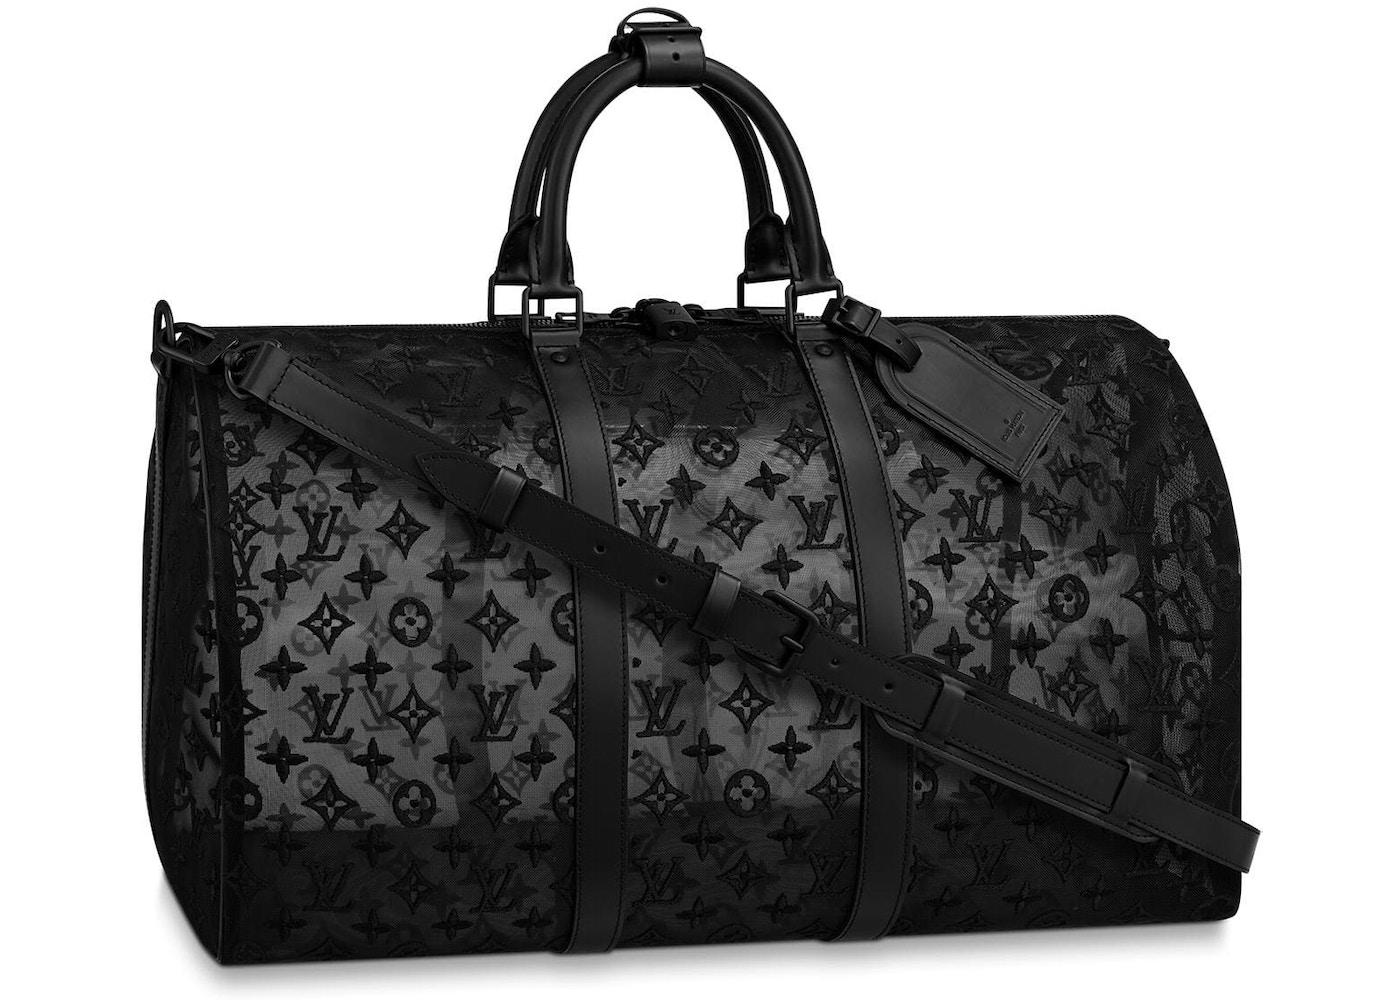 92466c89 Louis Vuitton Keepall Bandouliere Monogram Mesh 50 Black